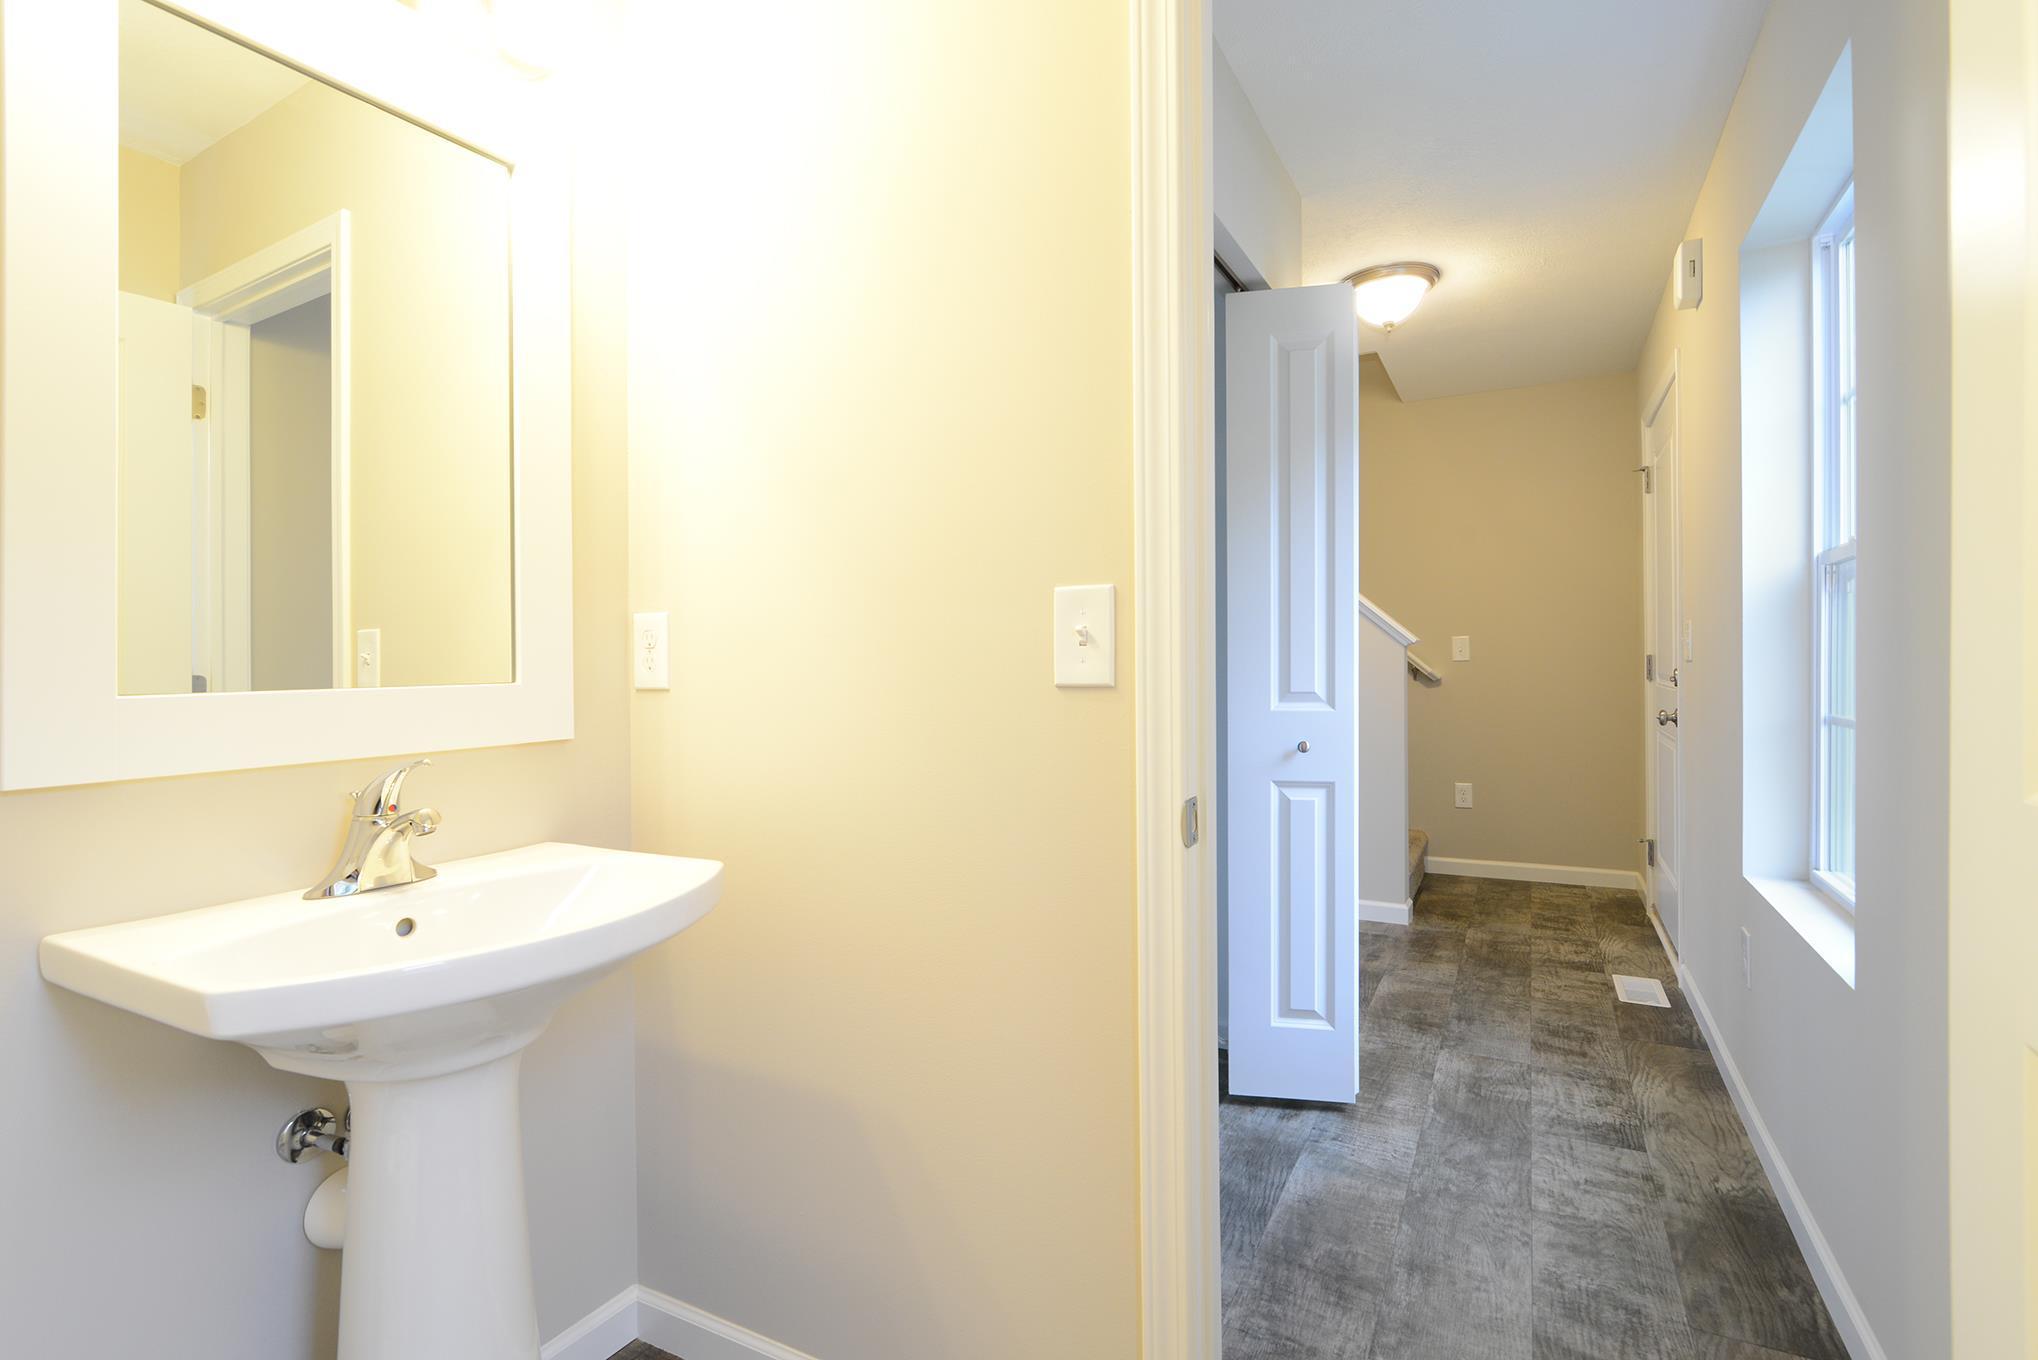 Bathroom featured in the Elements 1700 By Allen Edwin Homes in Ann Arbor, MI